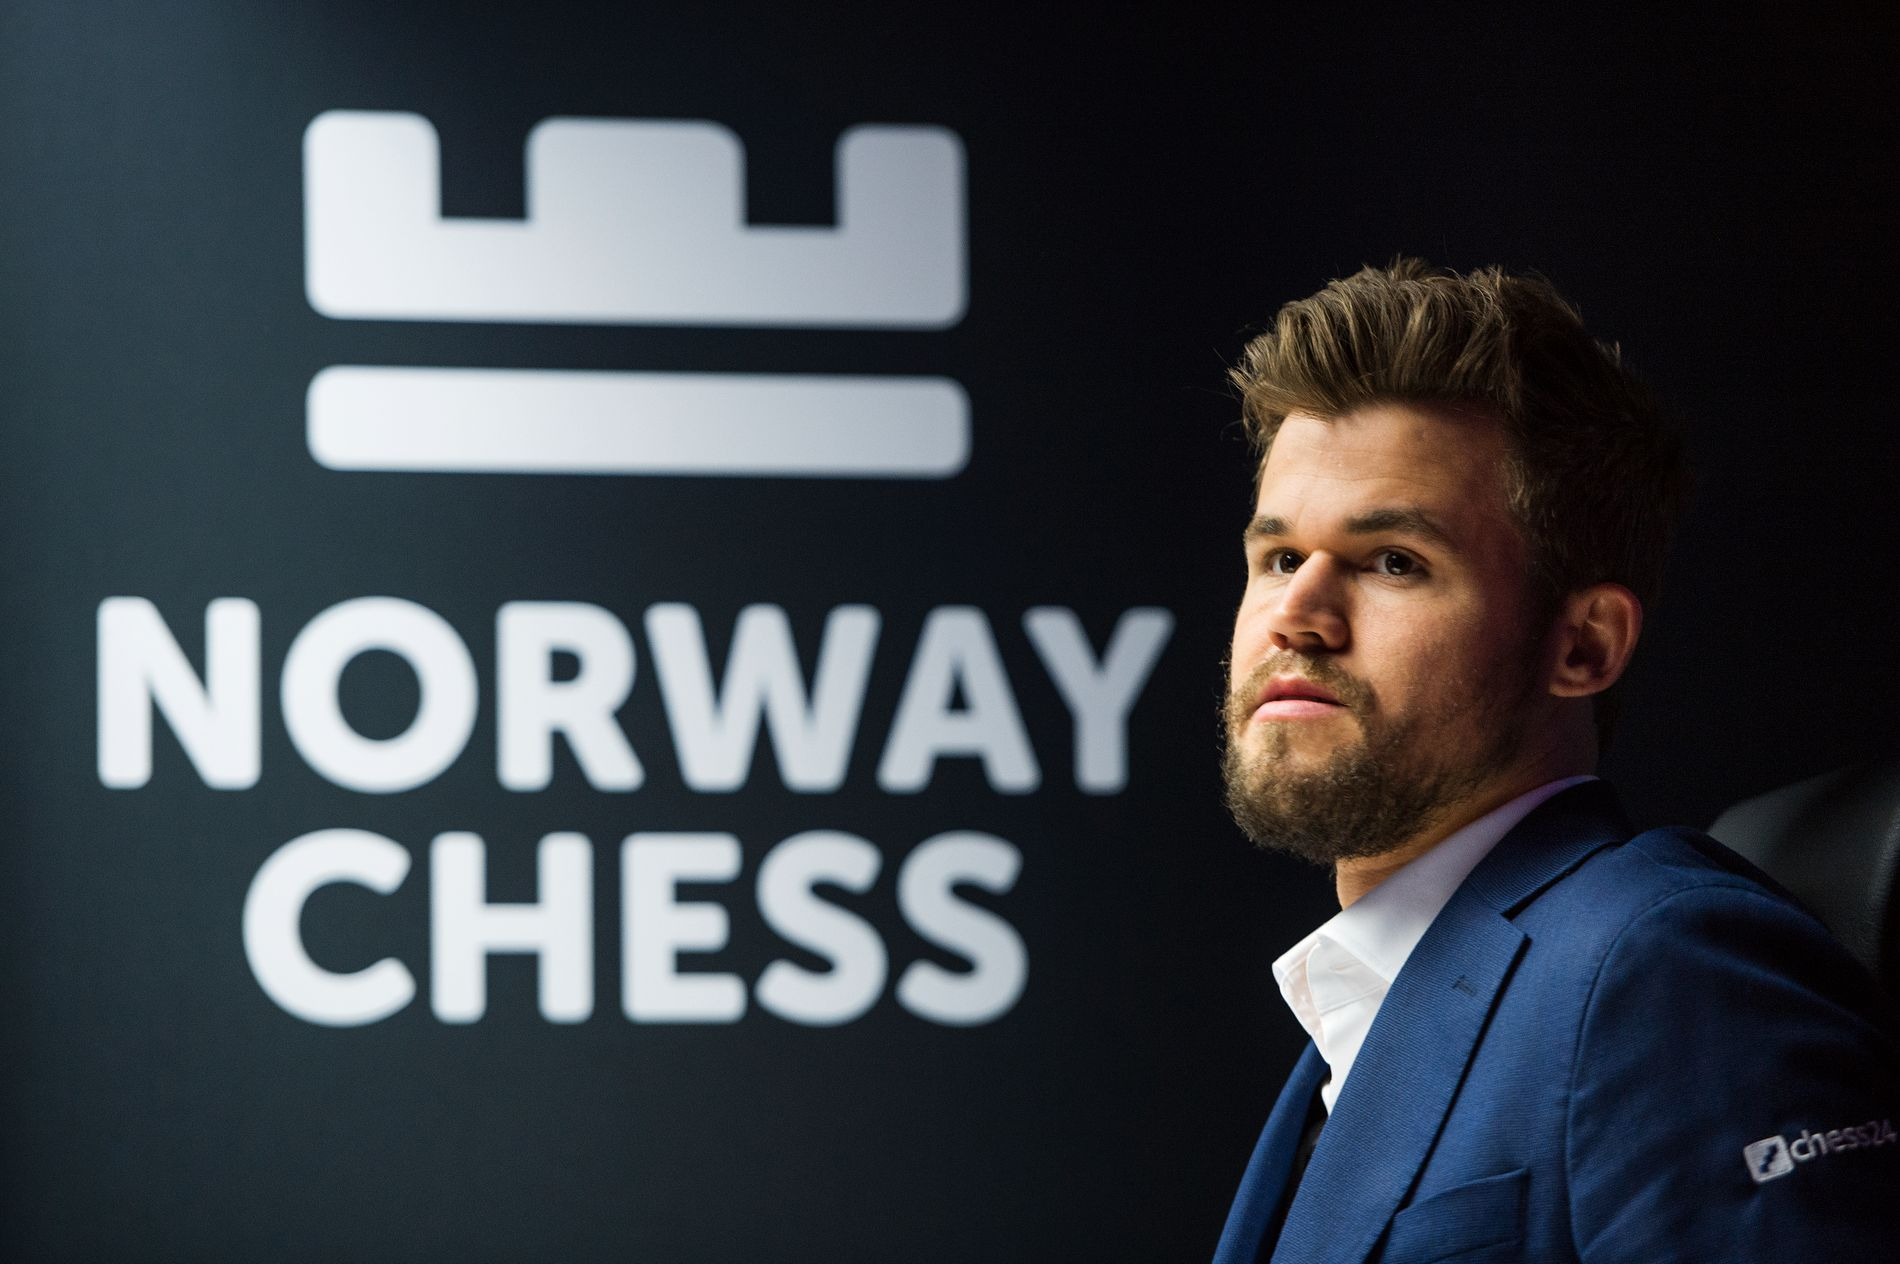 Magnus Carlsen har den siste tiden satt ytterligere fyr på debatten rundt norsk sjakks samarbeidsplaner med en utenlandsk spillgigant.